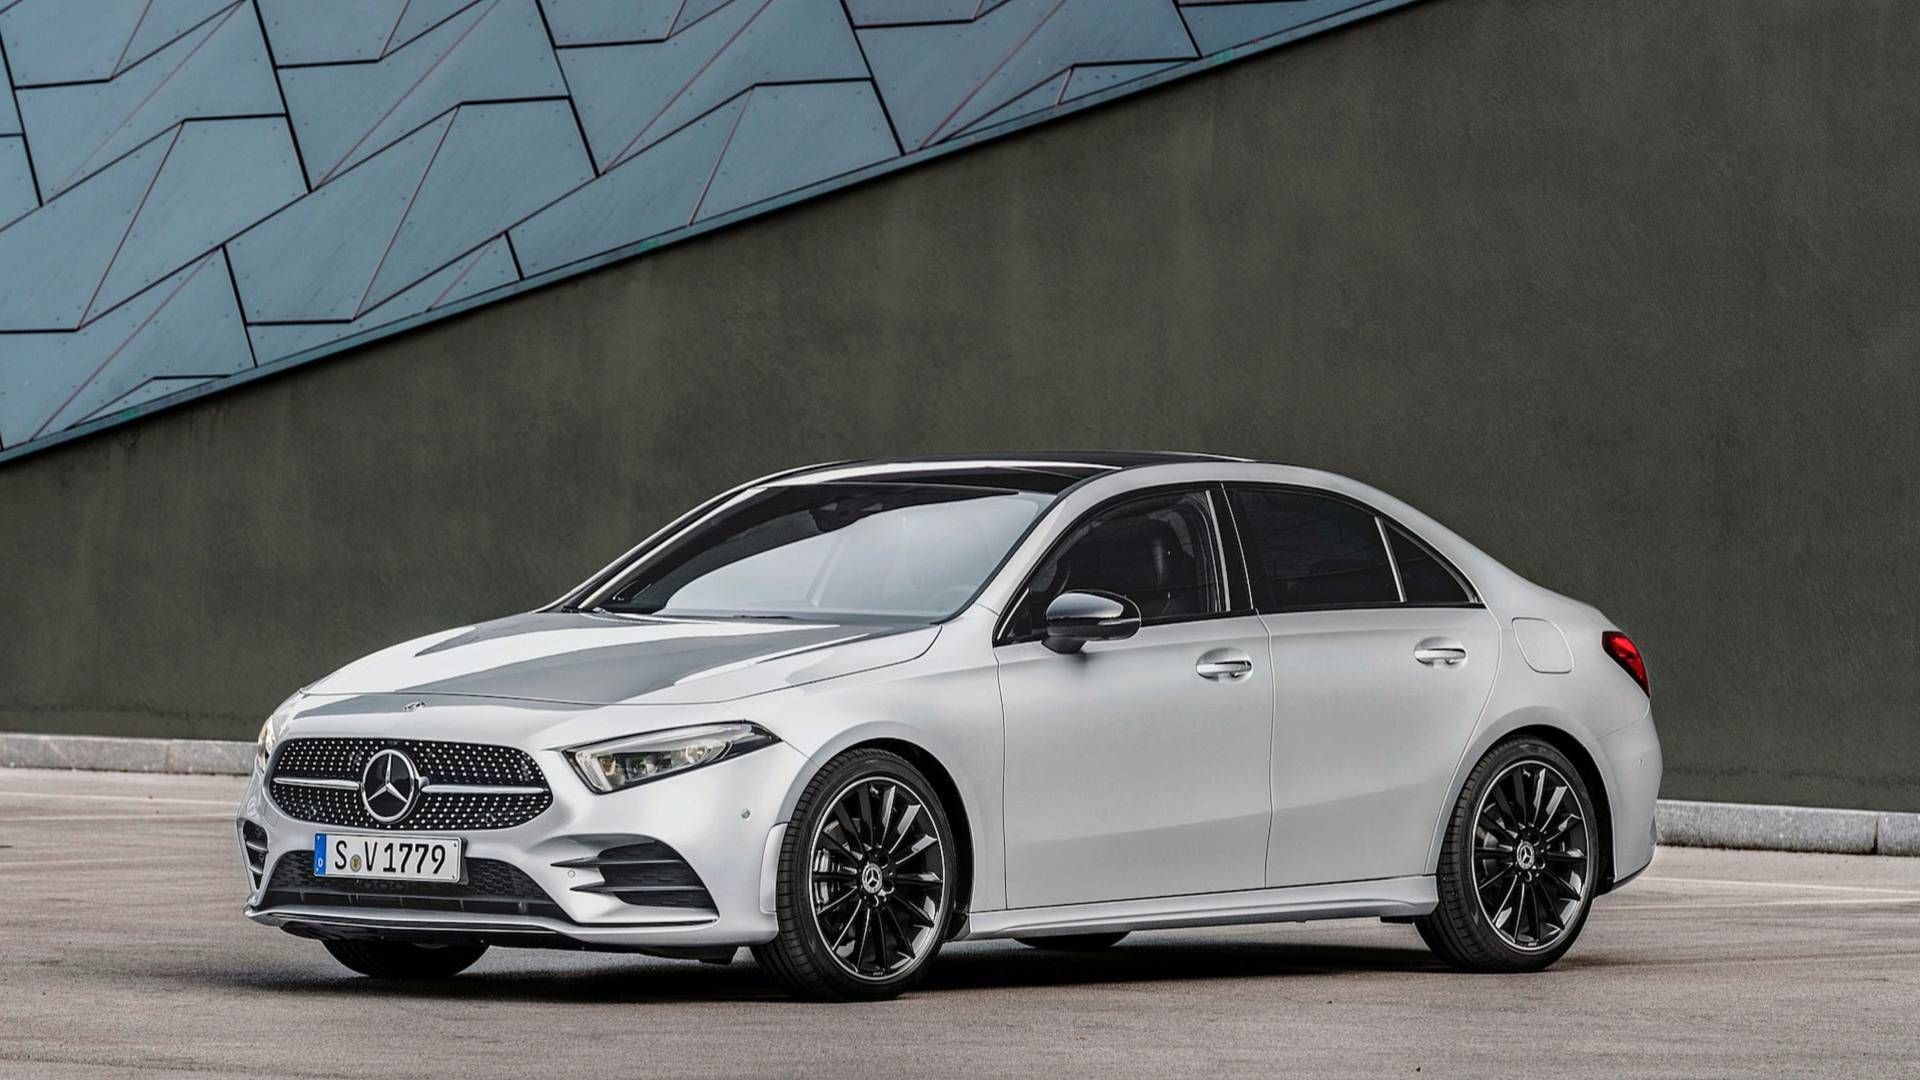 ROAD TEST: 2020 Mercedes A 220 4MATIC Sedan - Car Help Canada